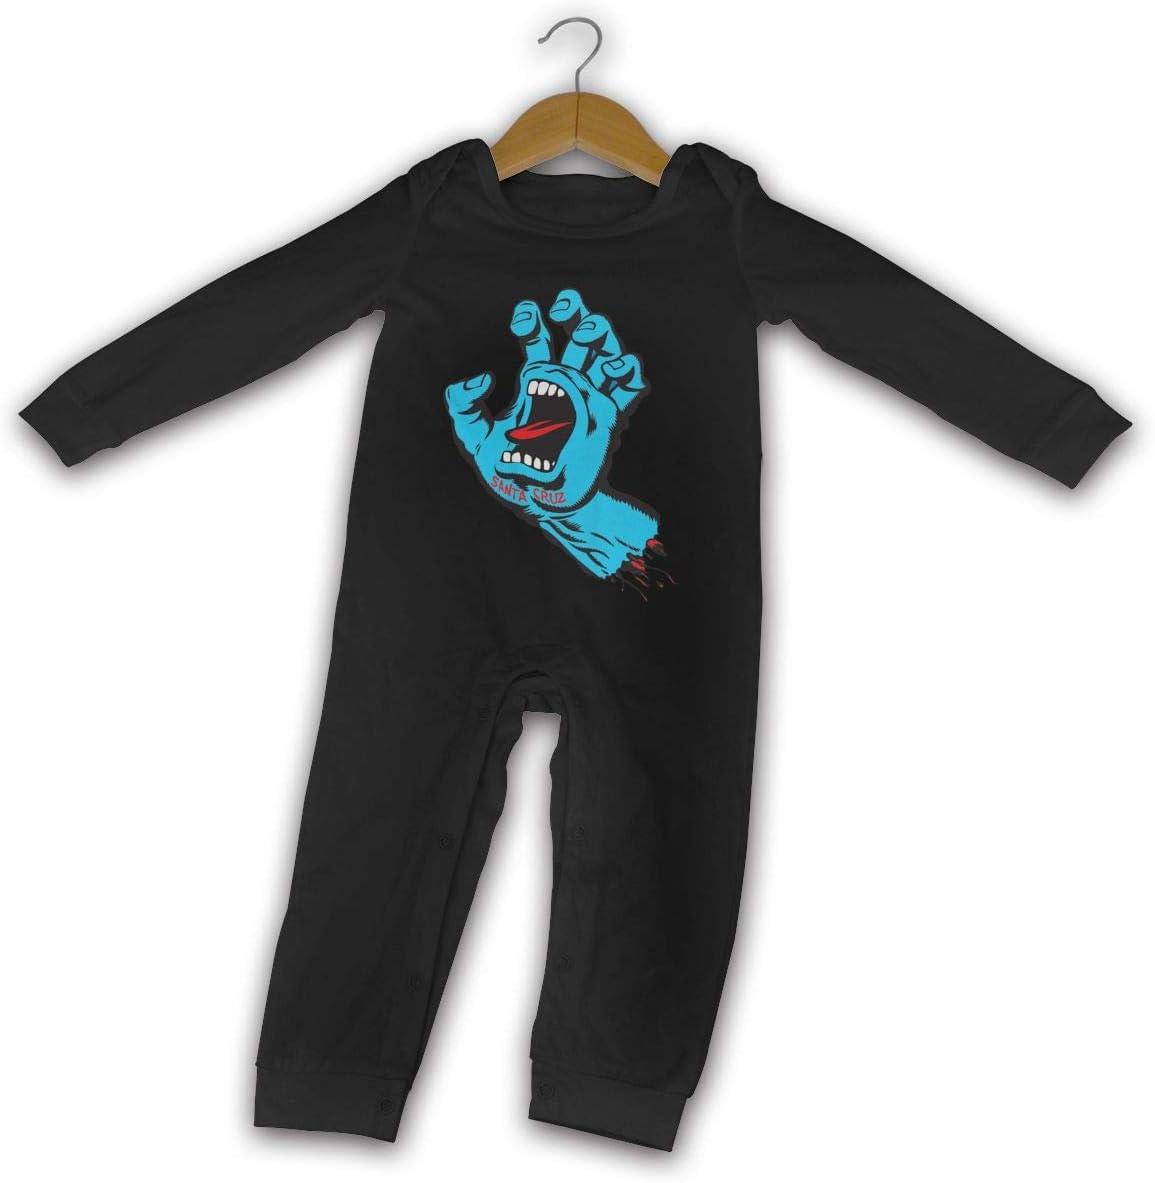 Yvonne/M/Pacheco Santa-Cruz Newborn GilrS Boys Kids Baby Romper Long Sleeve Infant Toddler Shirts